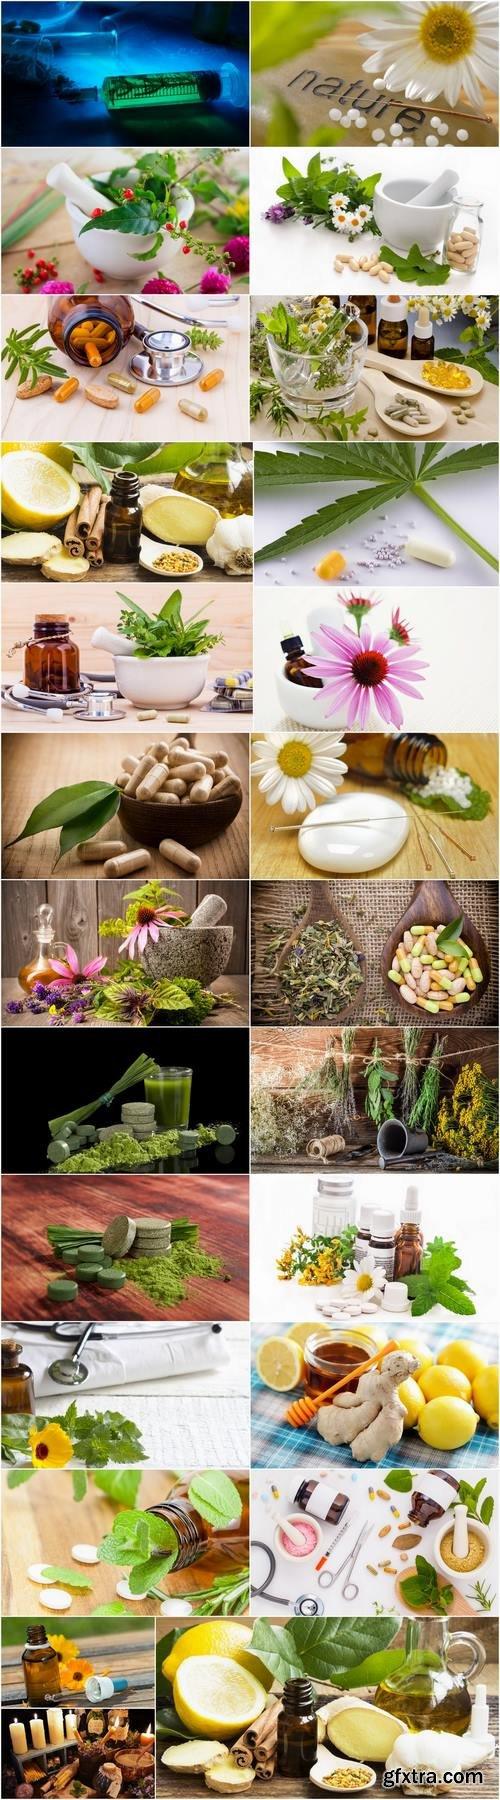 Medicinal herbs oil pill tablet 25 HQ Jpeg